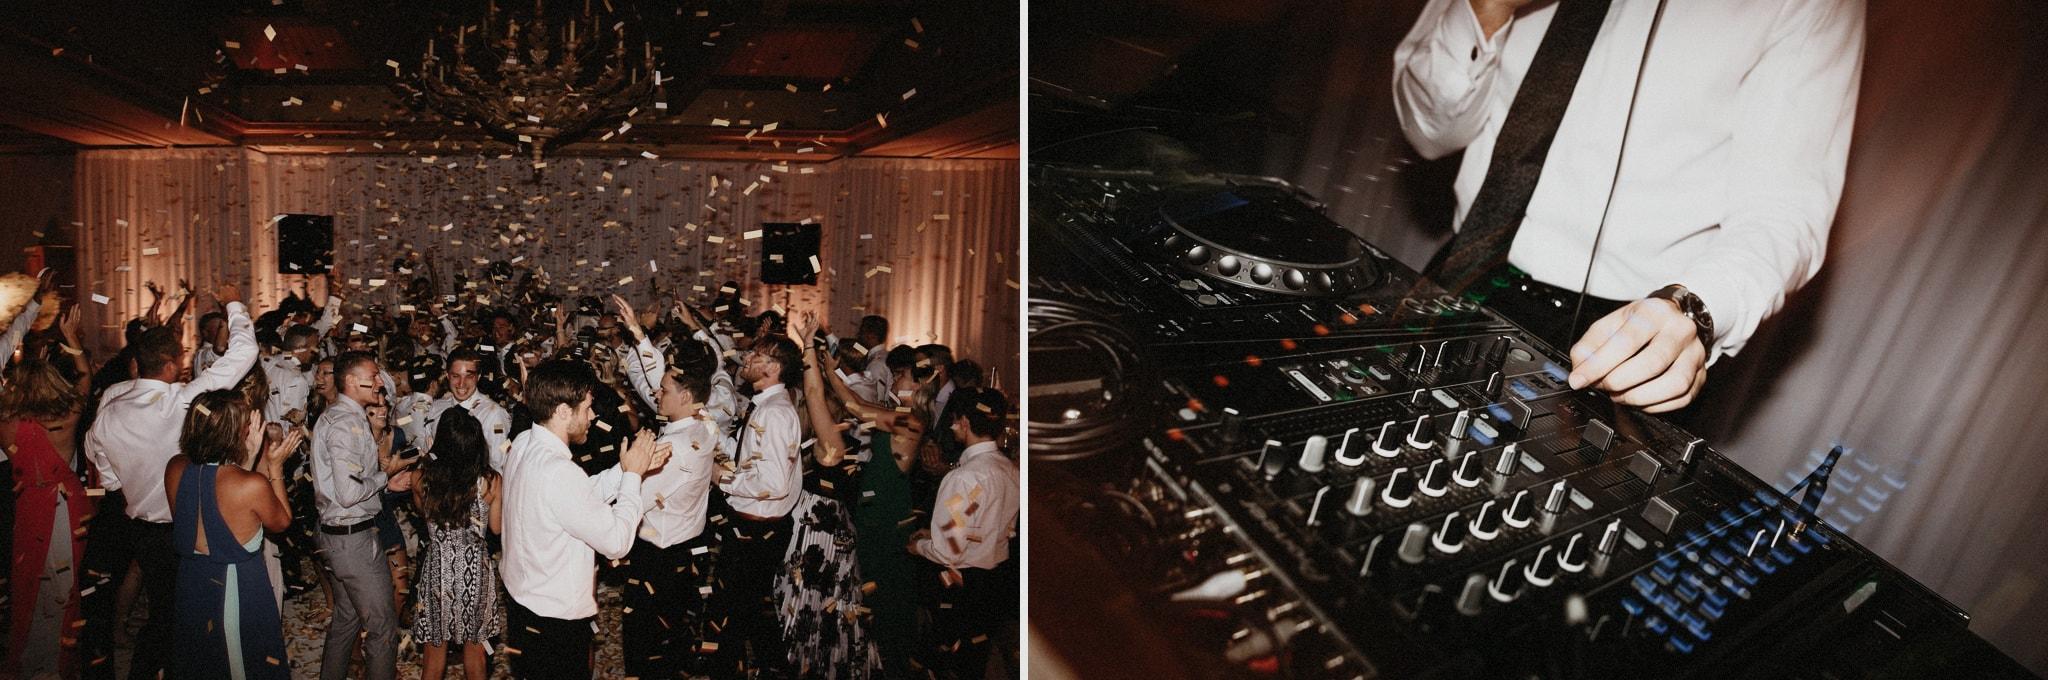 084-wedding-reception-dance-confetti-cannon.jpg